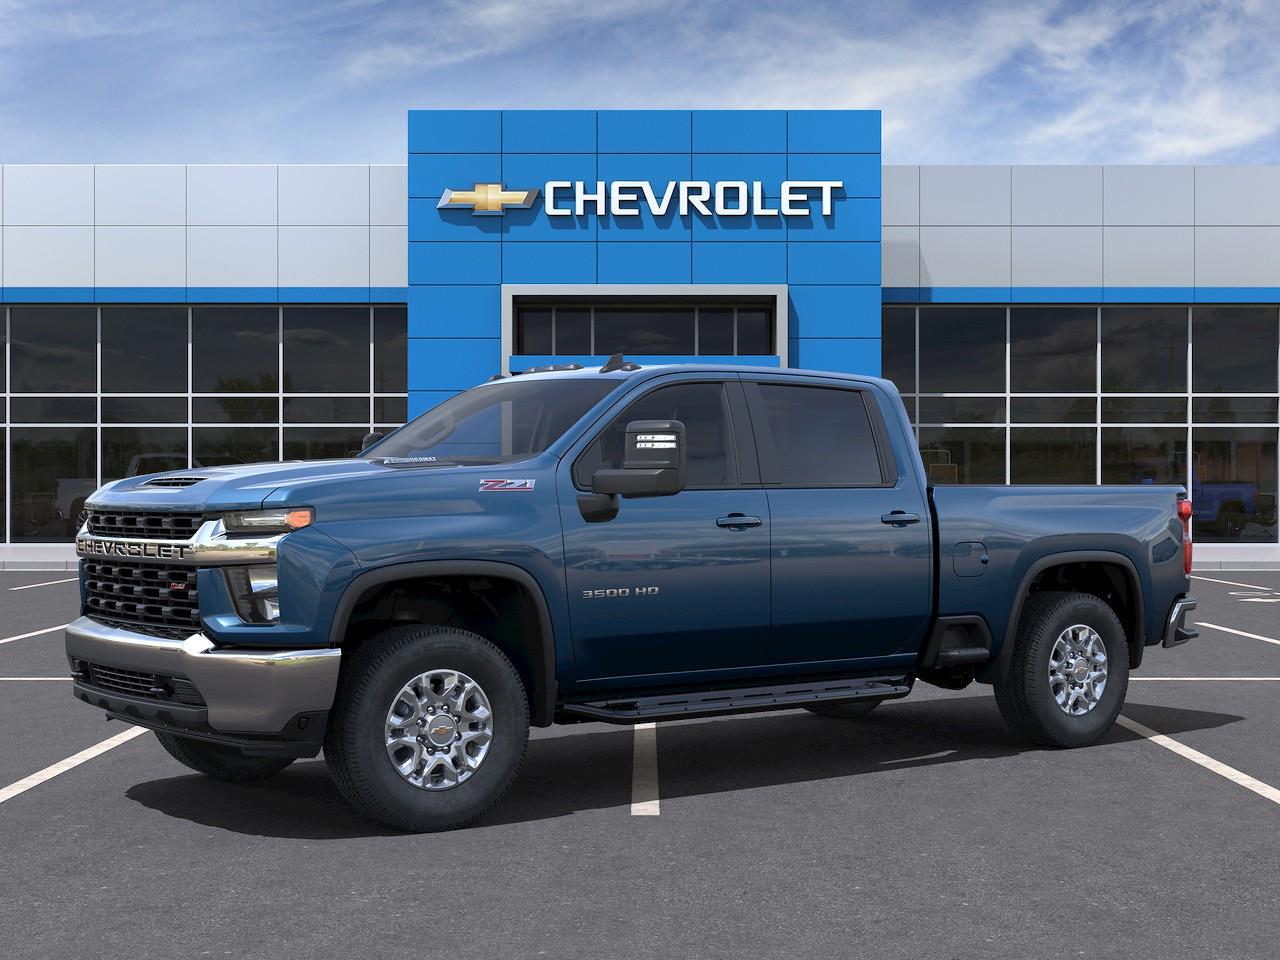 2021 Chevrolet Silverado 3500 Crew Cab 4x4, Pickup #Q210427 - photo 3